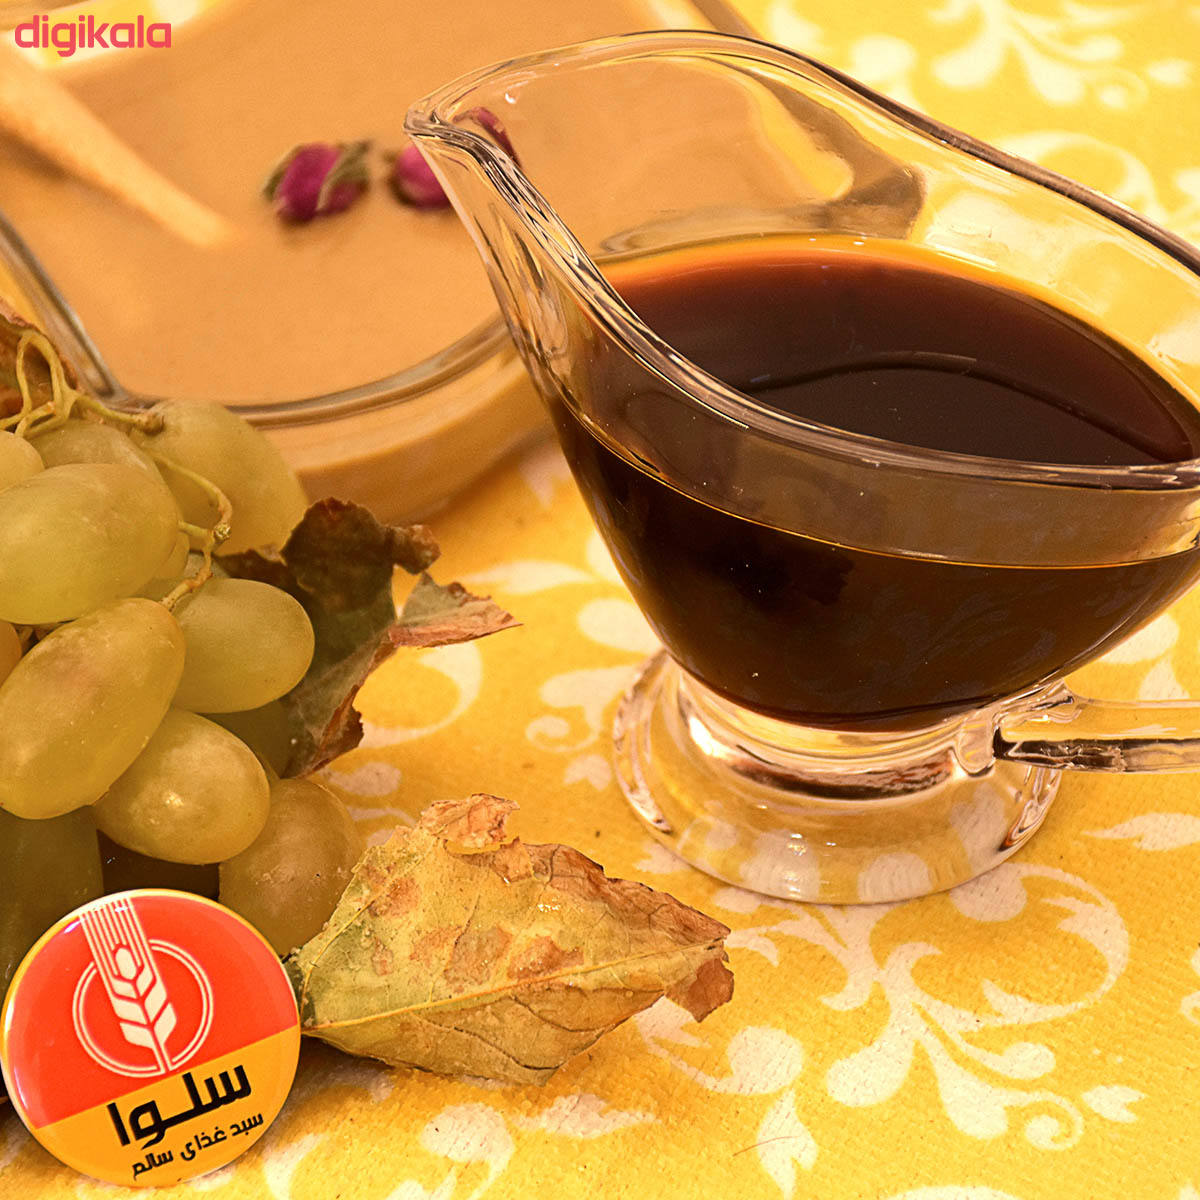 شیره انگور سلوا - 500 گرم main 1 1